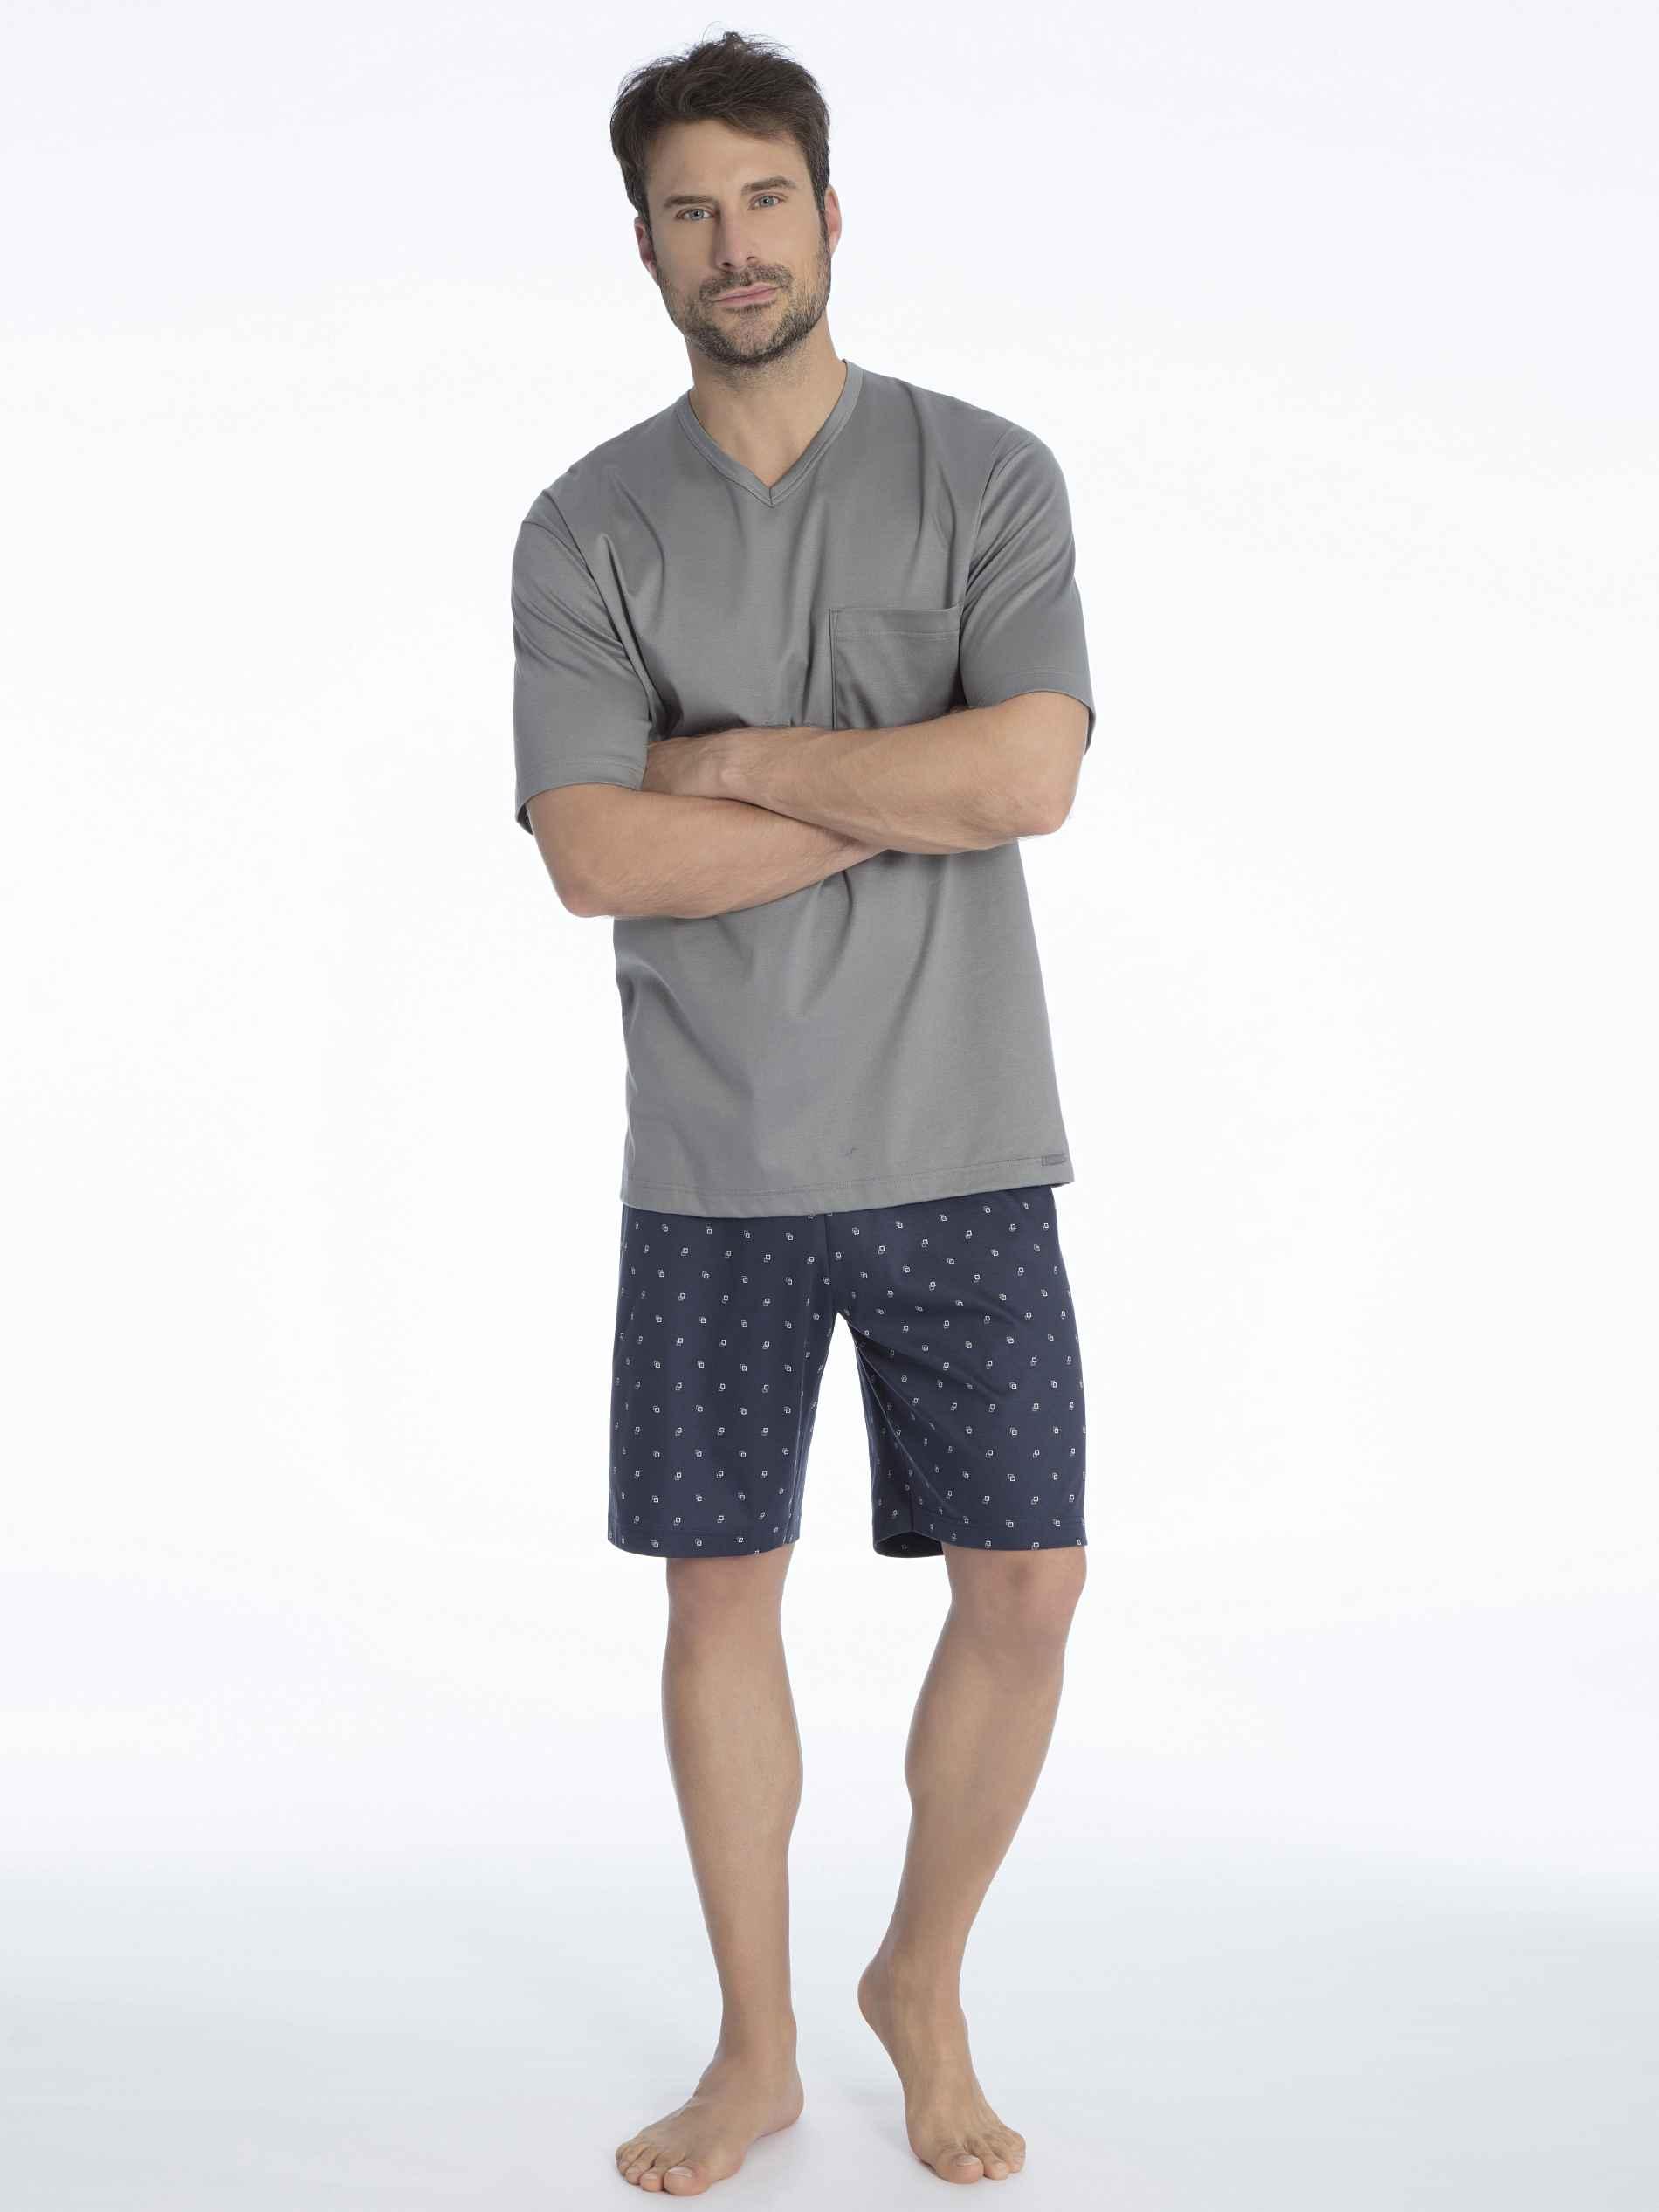 Herren CALIDA Travis Kurz-Pyjama grau   07613381058367